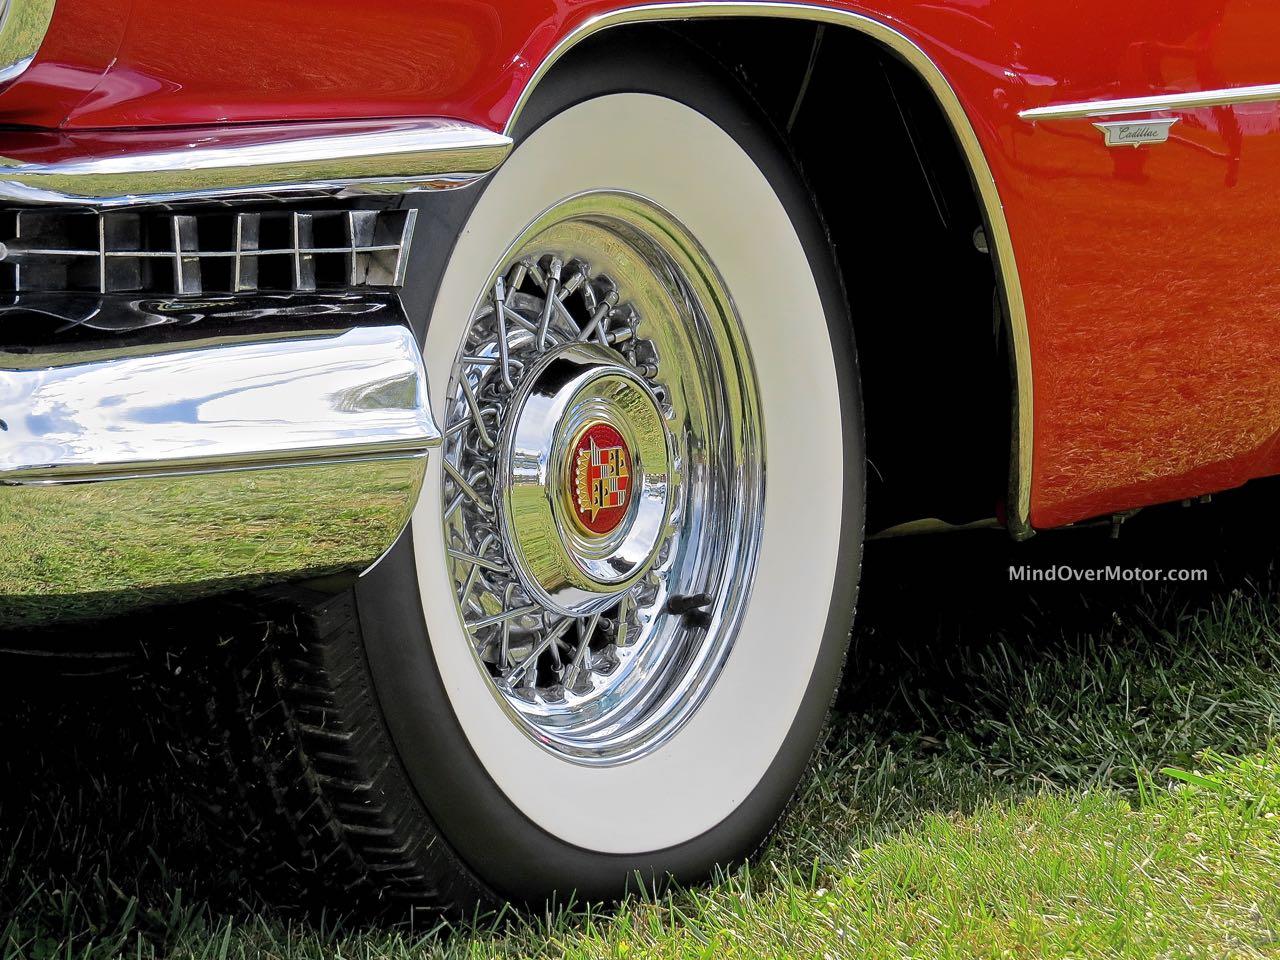 1959 Cadillac Series 62 Rim